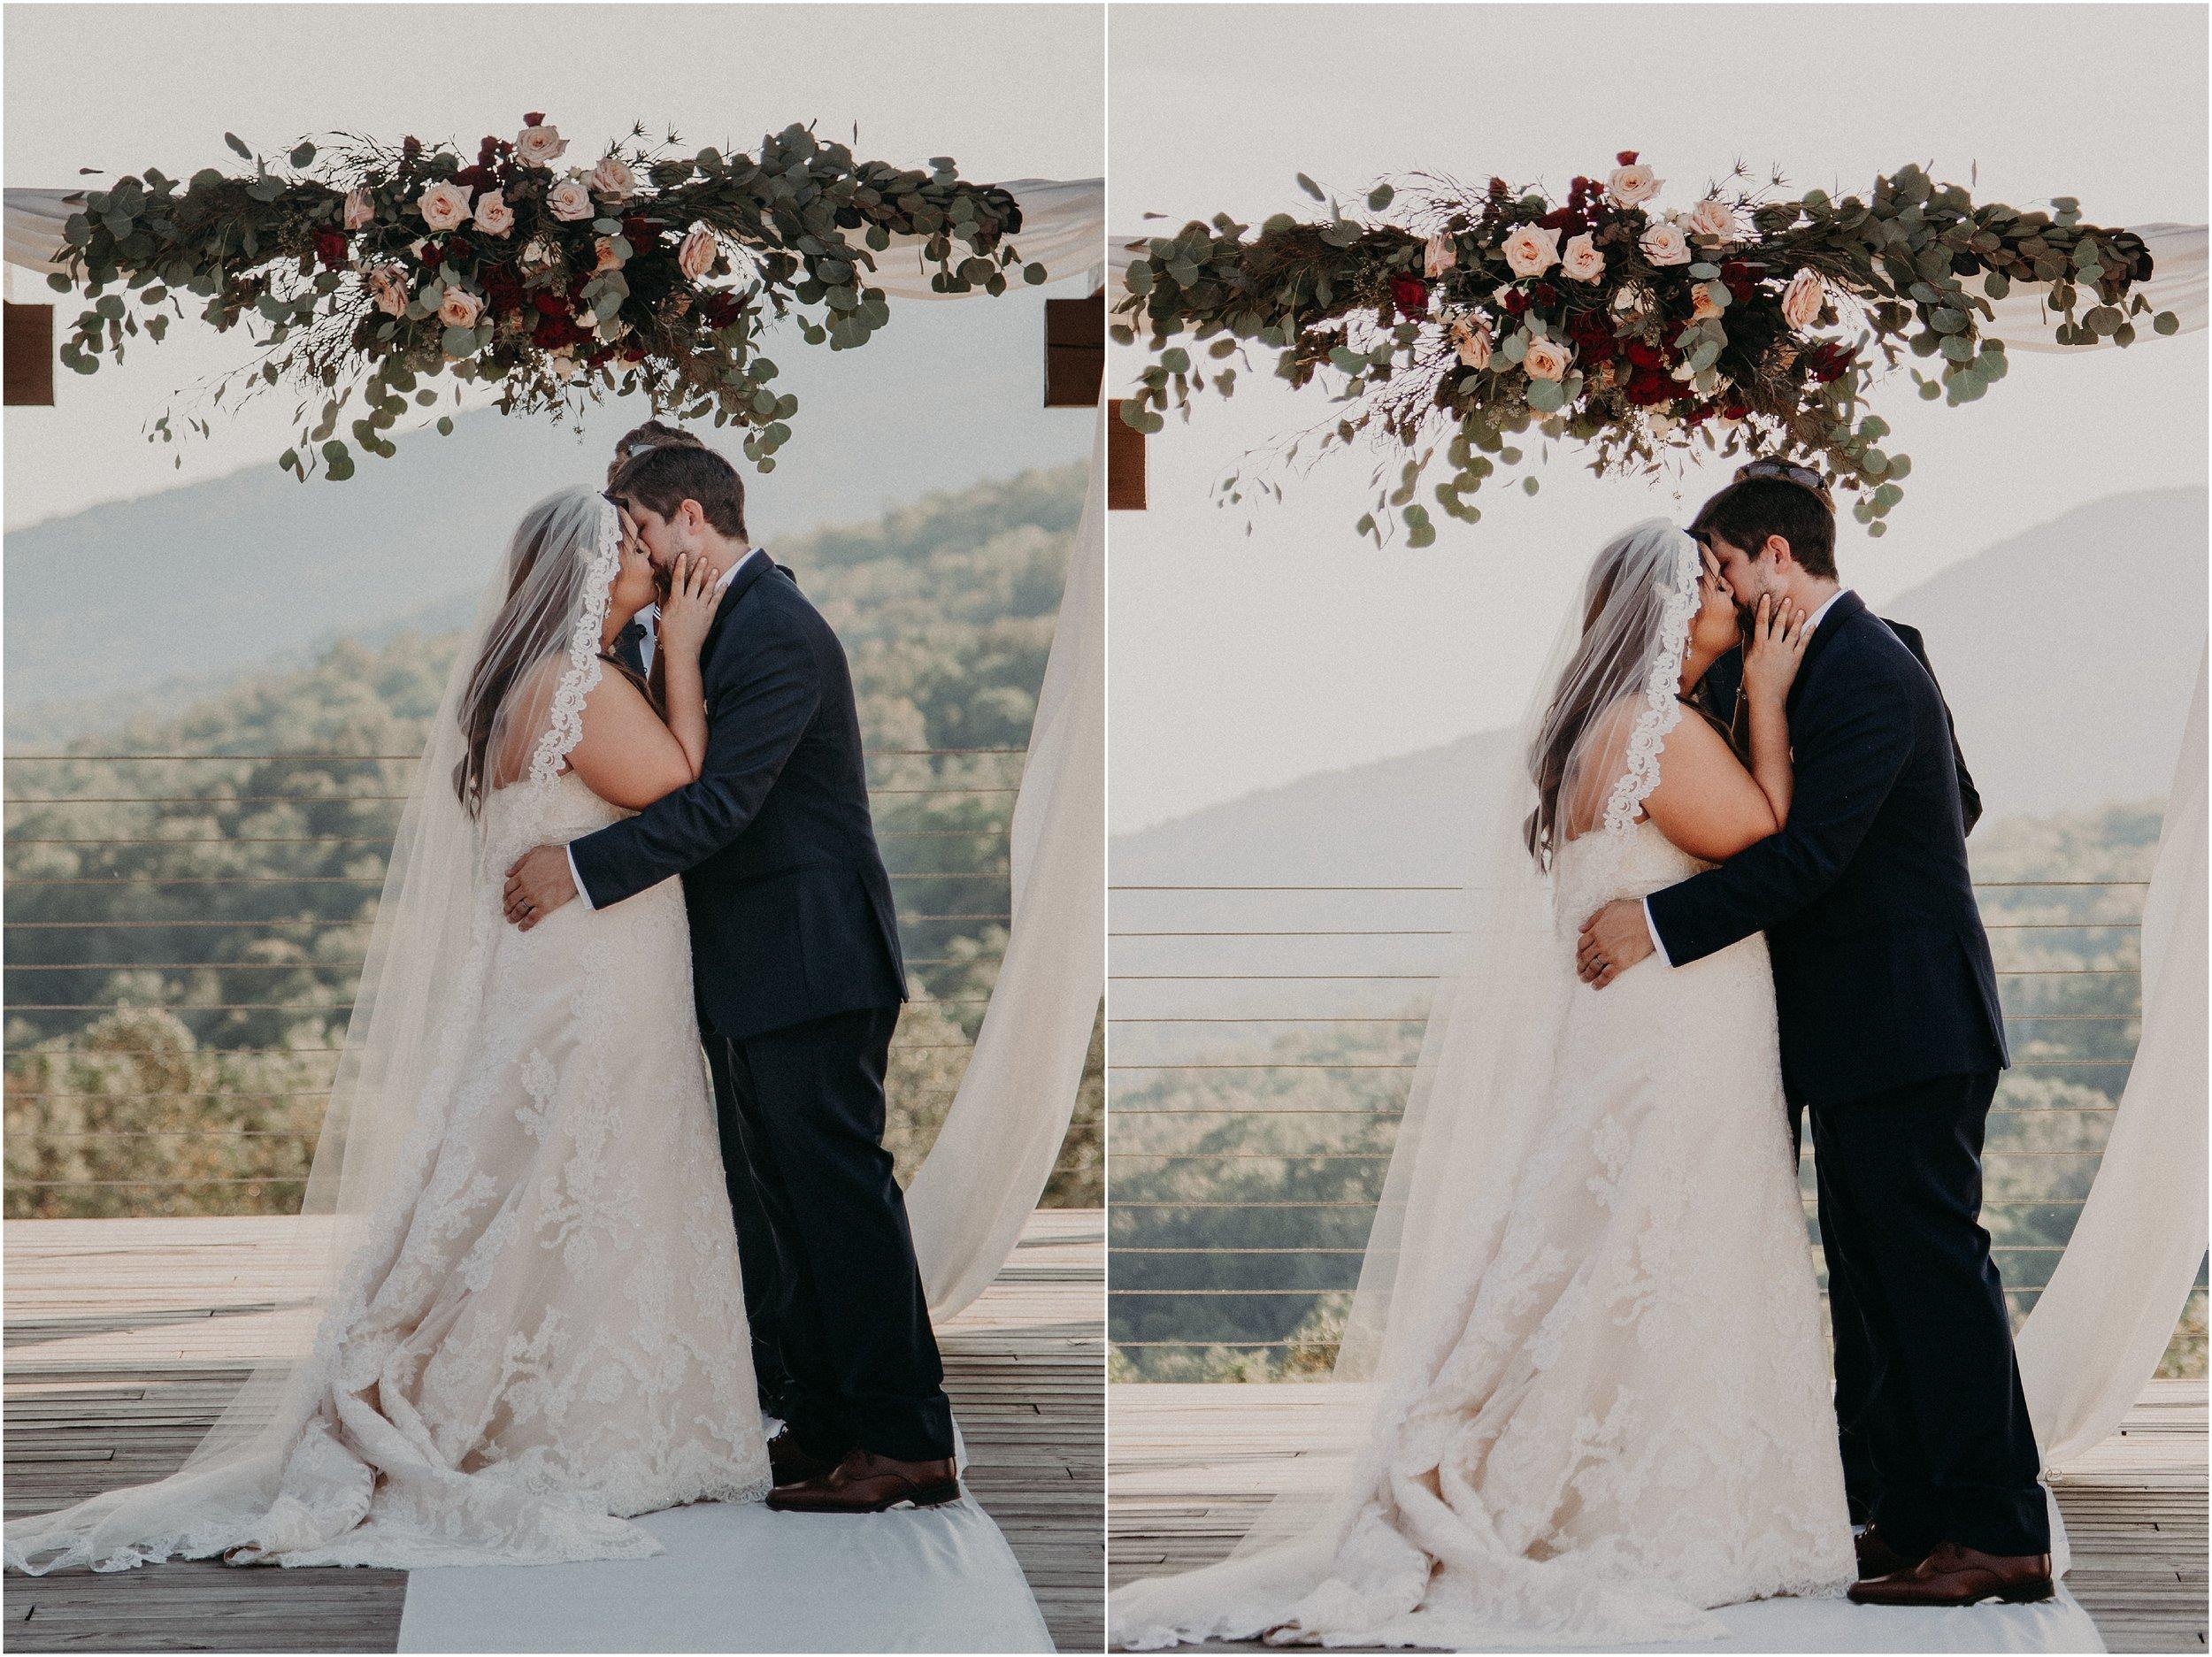 You may now kiss the bride at Debarge Winery Vineyard wedding